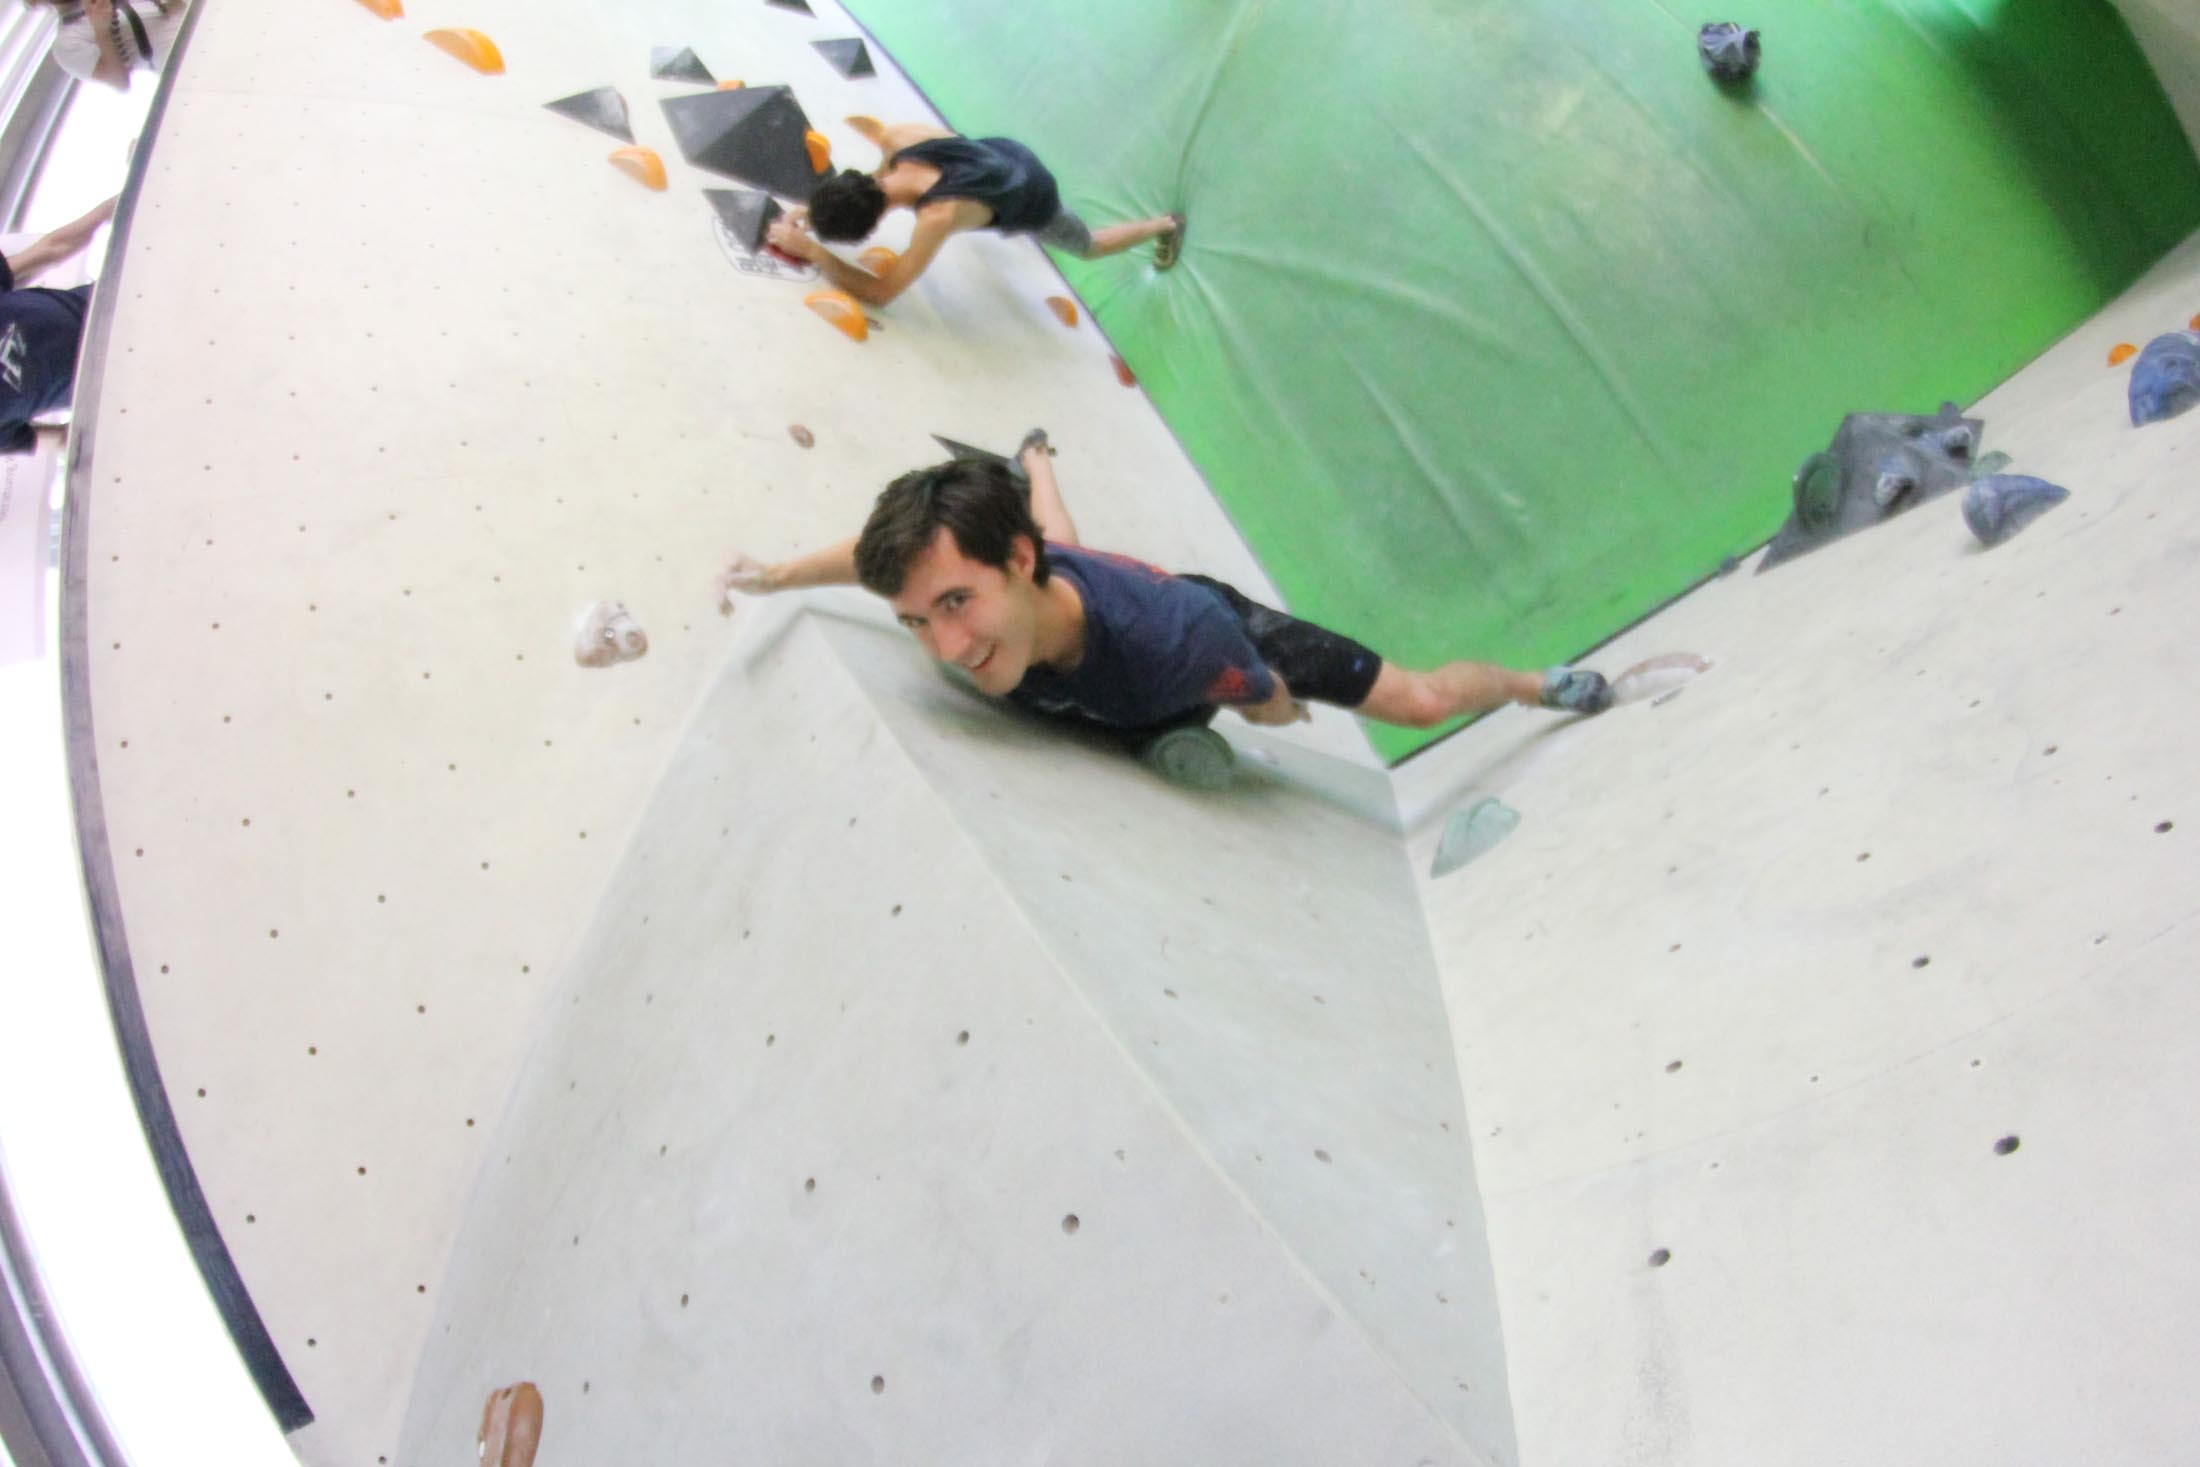 Quali, internationaler bouldercup Frankenjura 2016, BLOCKHELDEN Erlangen, Mammut, Bergfreunde.de, Boulderwettkampf07092016163